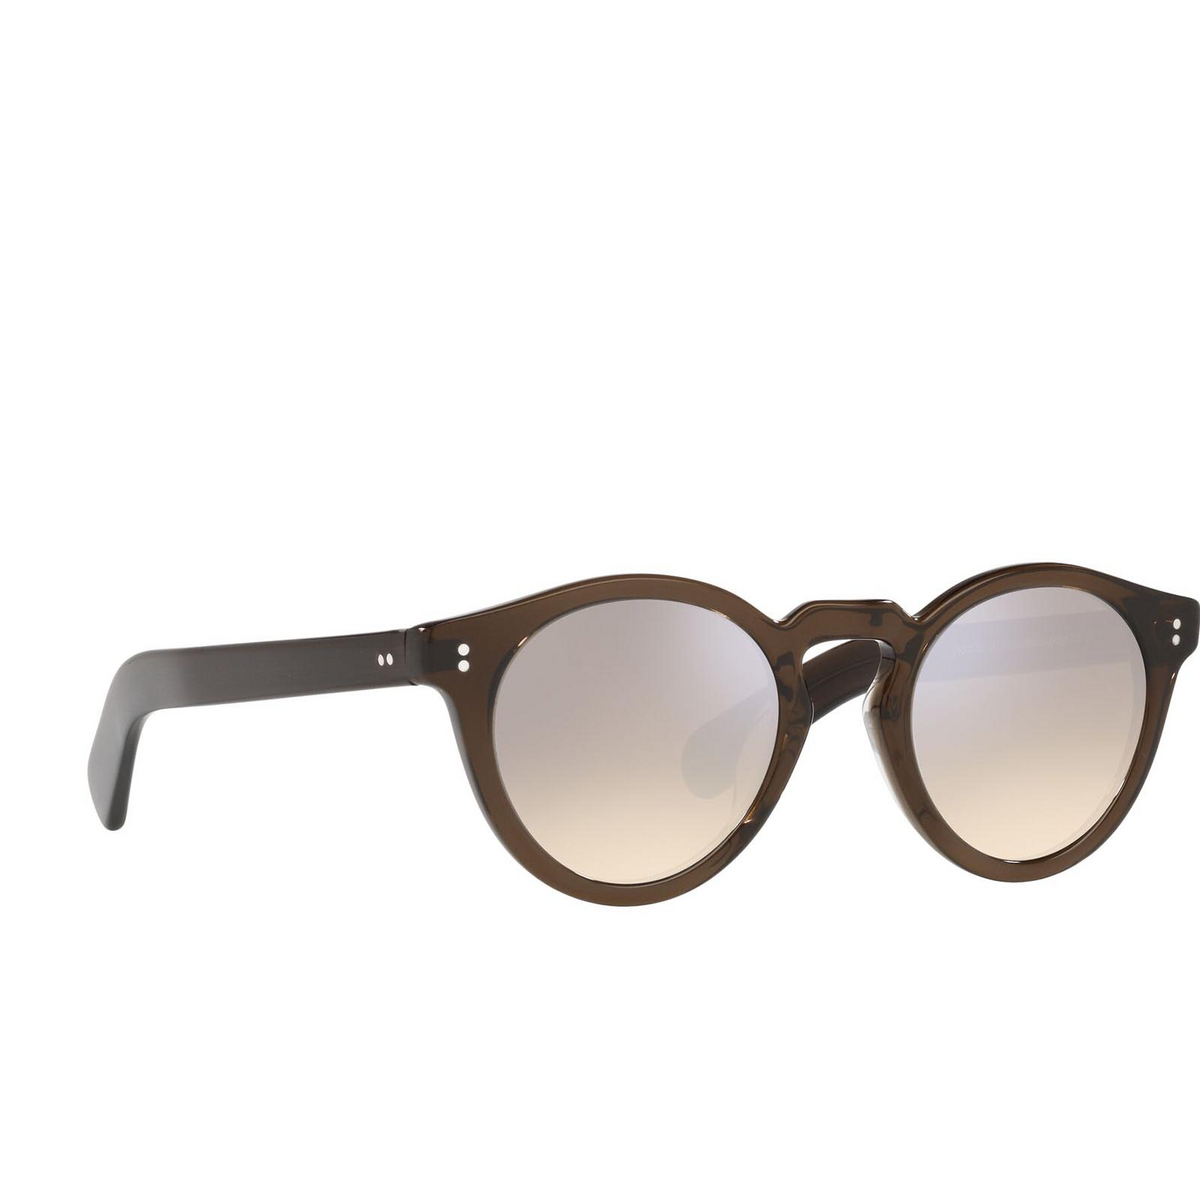 Oliver Peoples® Round Sunglasses: Martineaux OV5450SU color Espresso 162532 - three-quarters view.